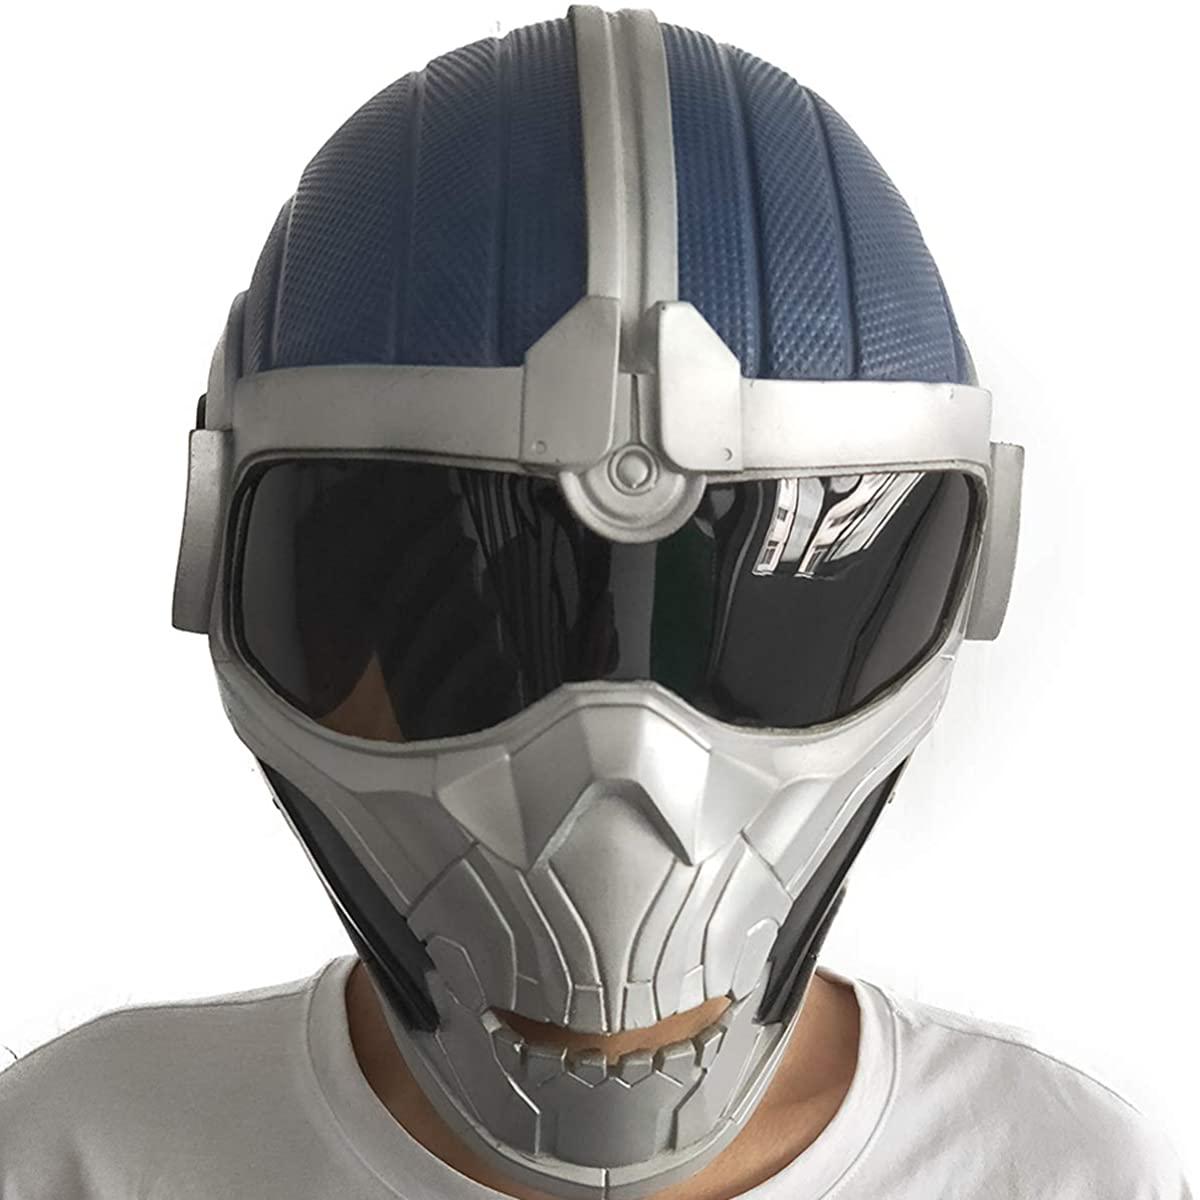 ZMJ Taskmaster Mask Latex Helmet Marvel Black Widow Cosplay Accessory Halloween Deluxe Costume Props